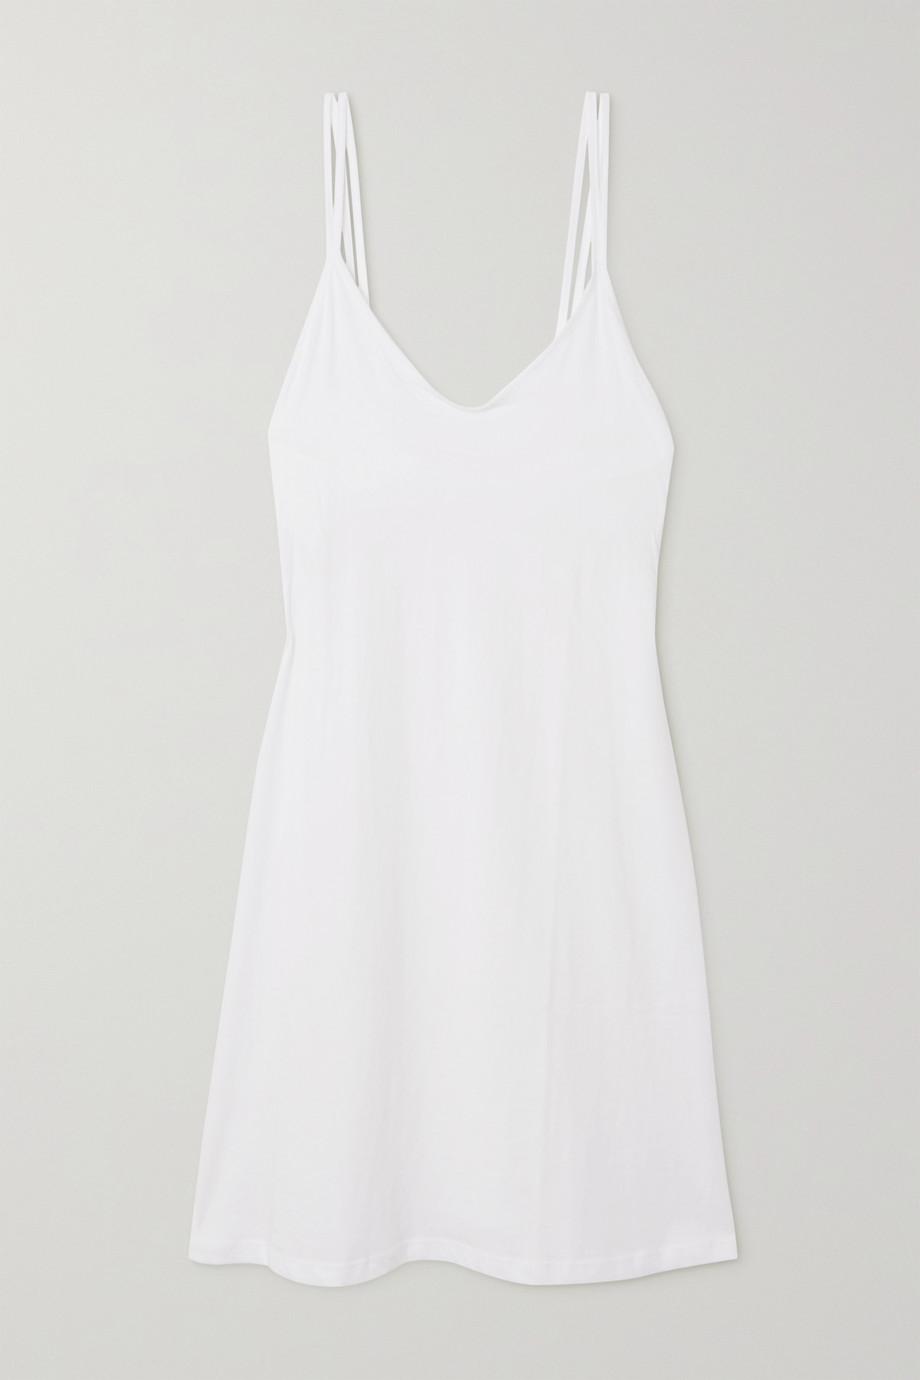 Skin Cassia Nachthemd aus Bio-Pima-Baumwoll-Jersey